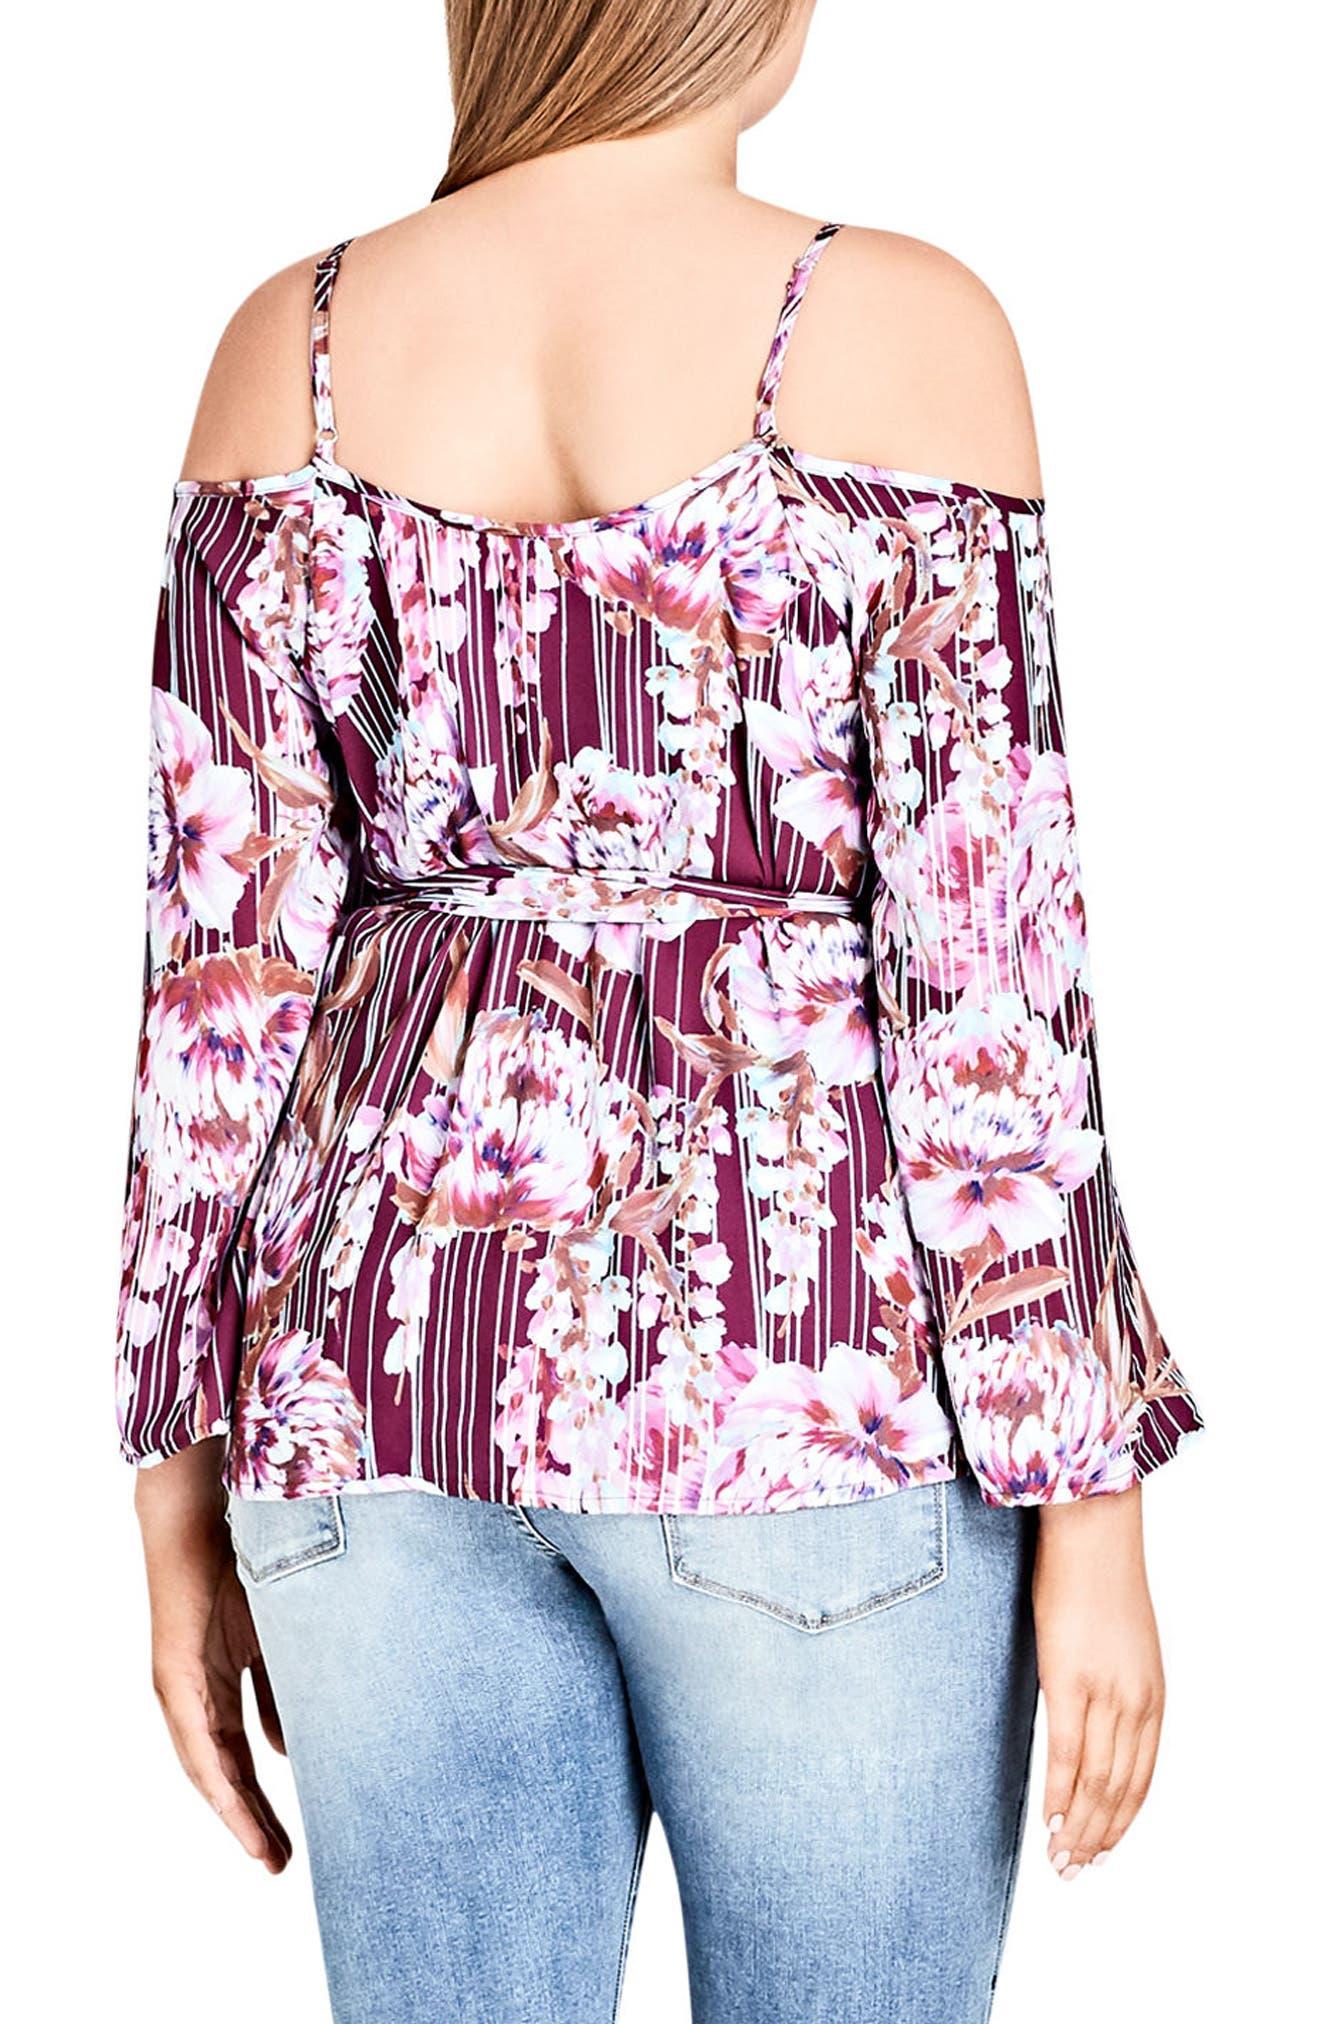 Alternate Image 2  - City Chic Arthouse Floral Tie Waist Cold Shoulder Top (Plus Size)